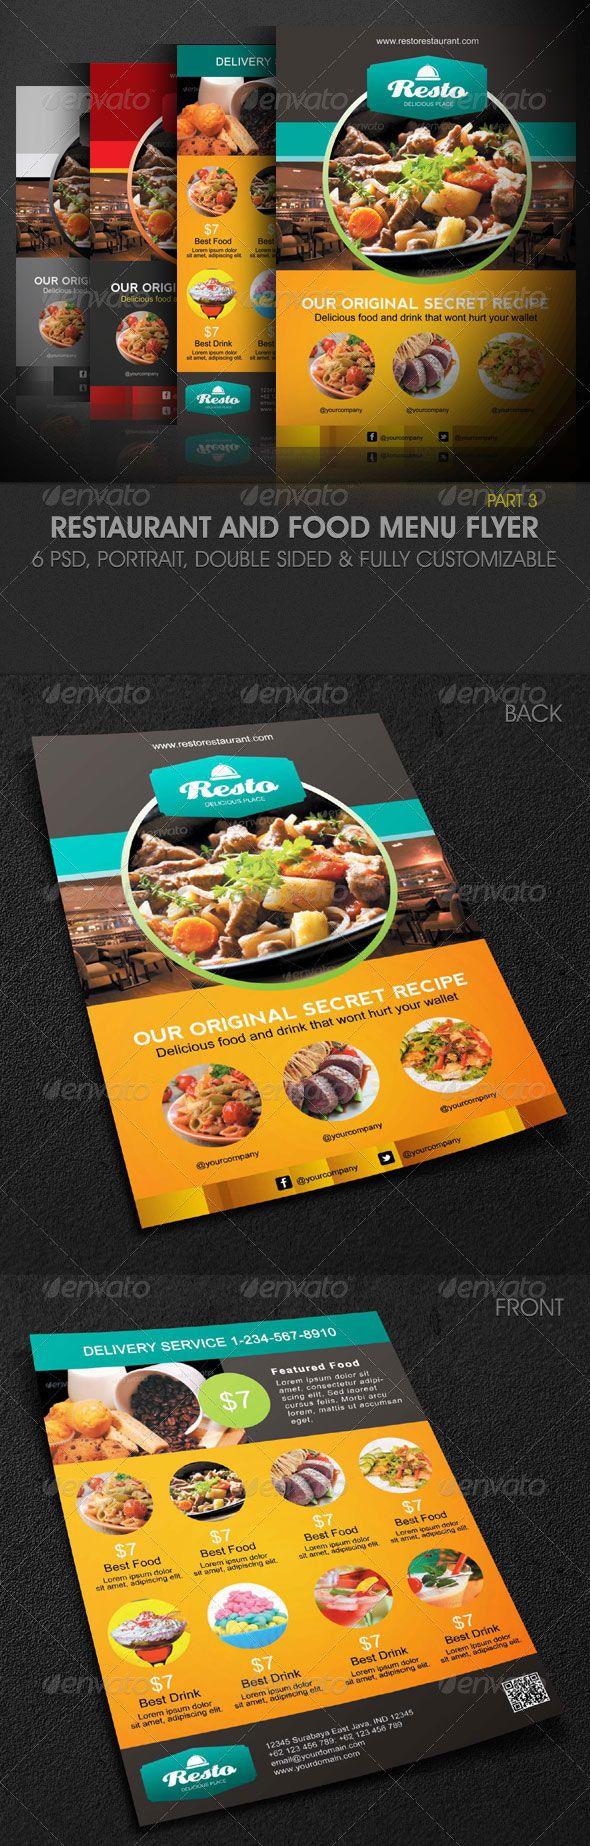 Attractive Modern Restaurant and Food Menu Flyer